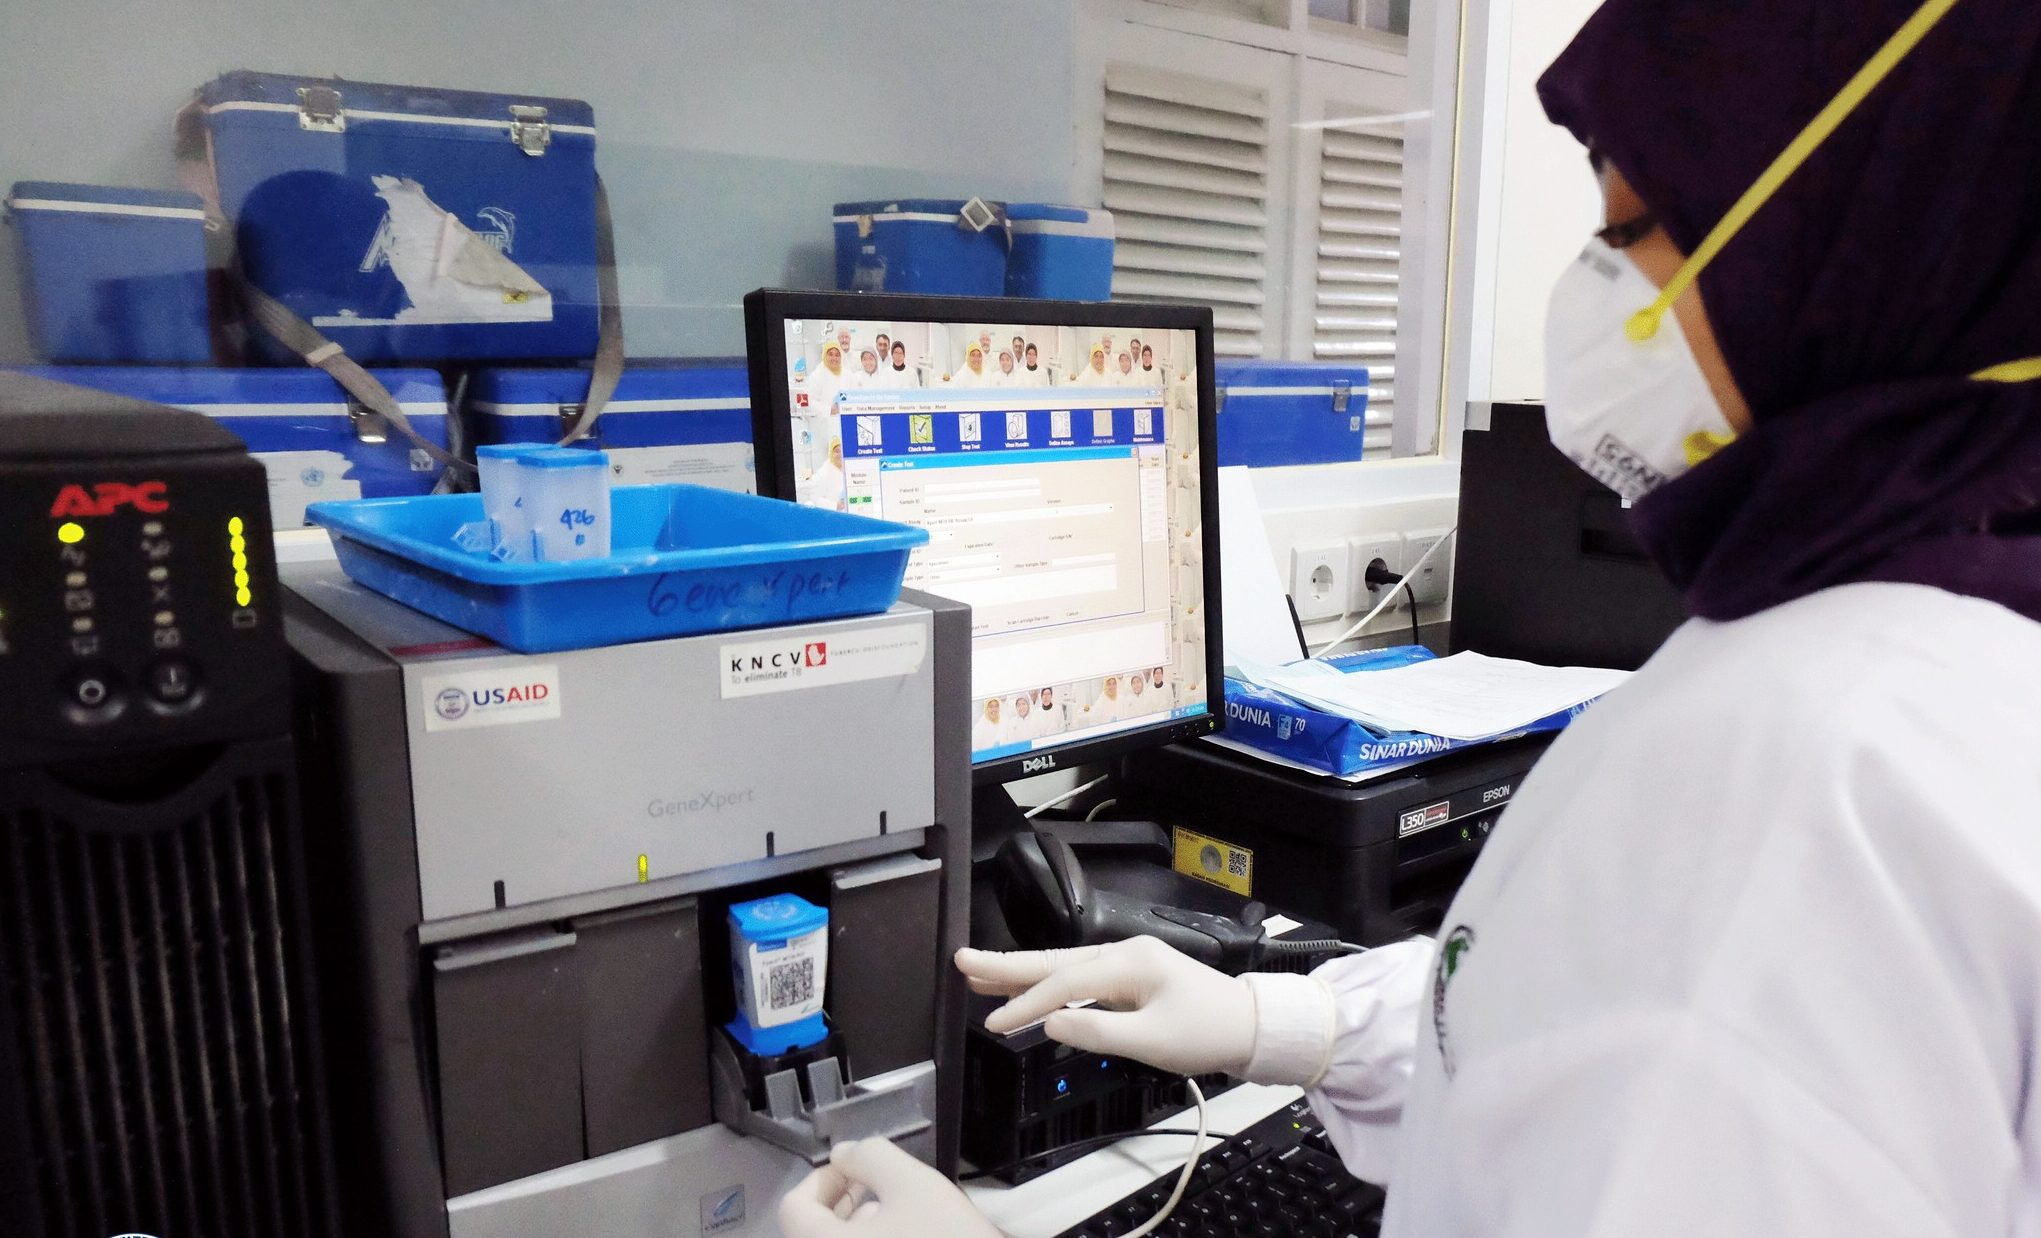 Global Diagnostic Cartridge Field Diagnostic System Market 2020 Key  Business Strategies – Abbott, ARKRAY, Roche, Danaher, Bio-Rad Laboratories  – Owned